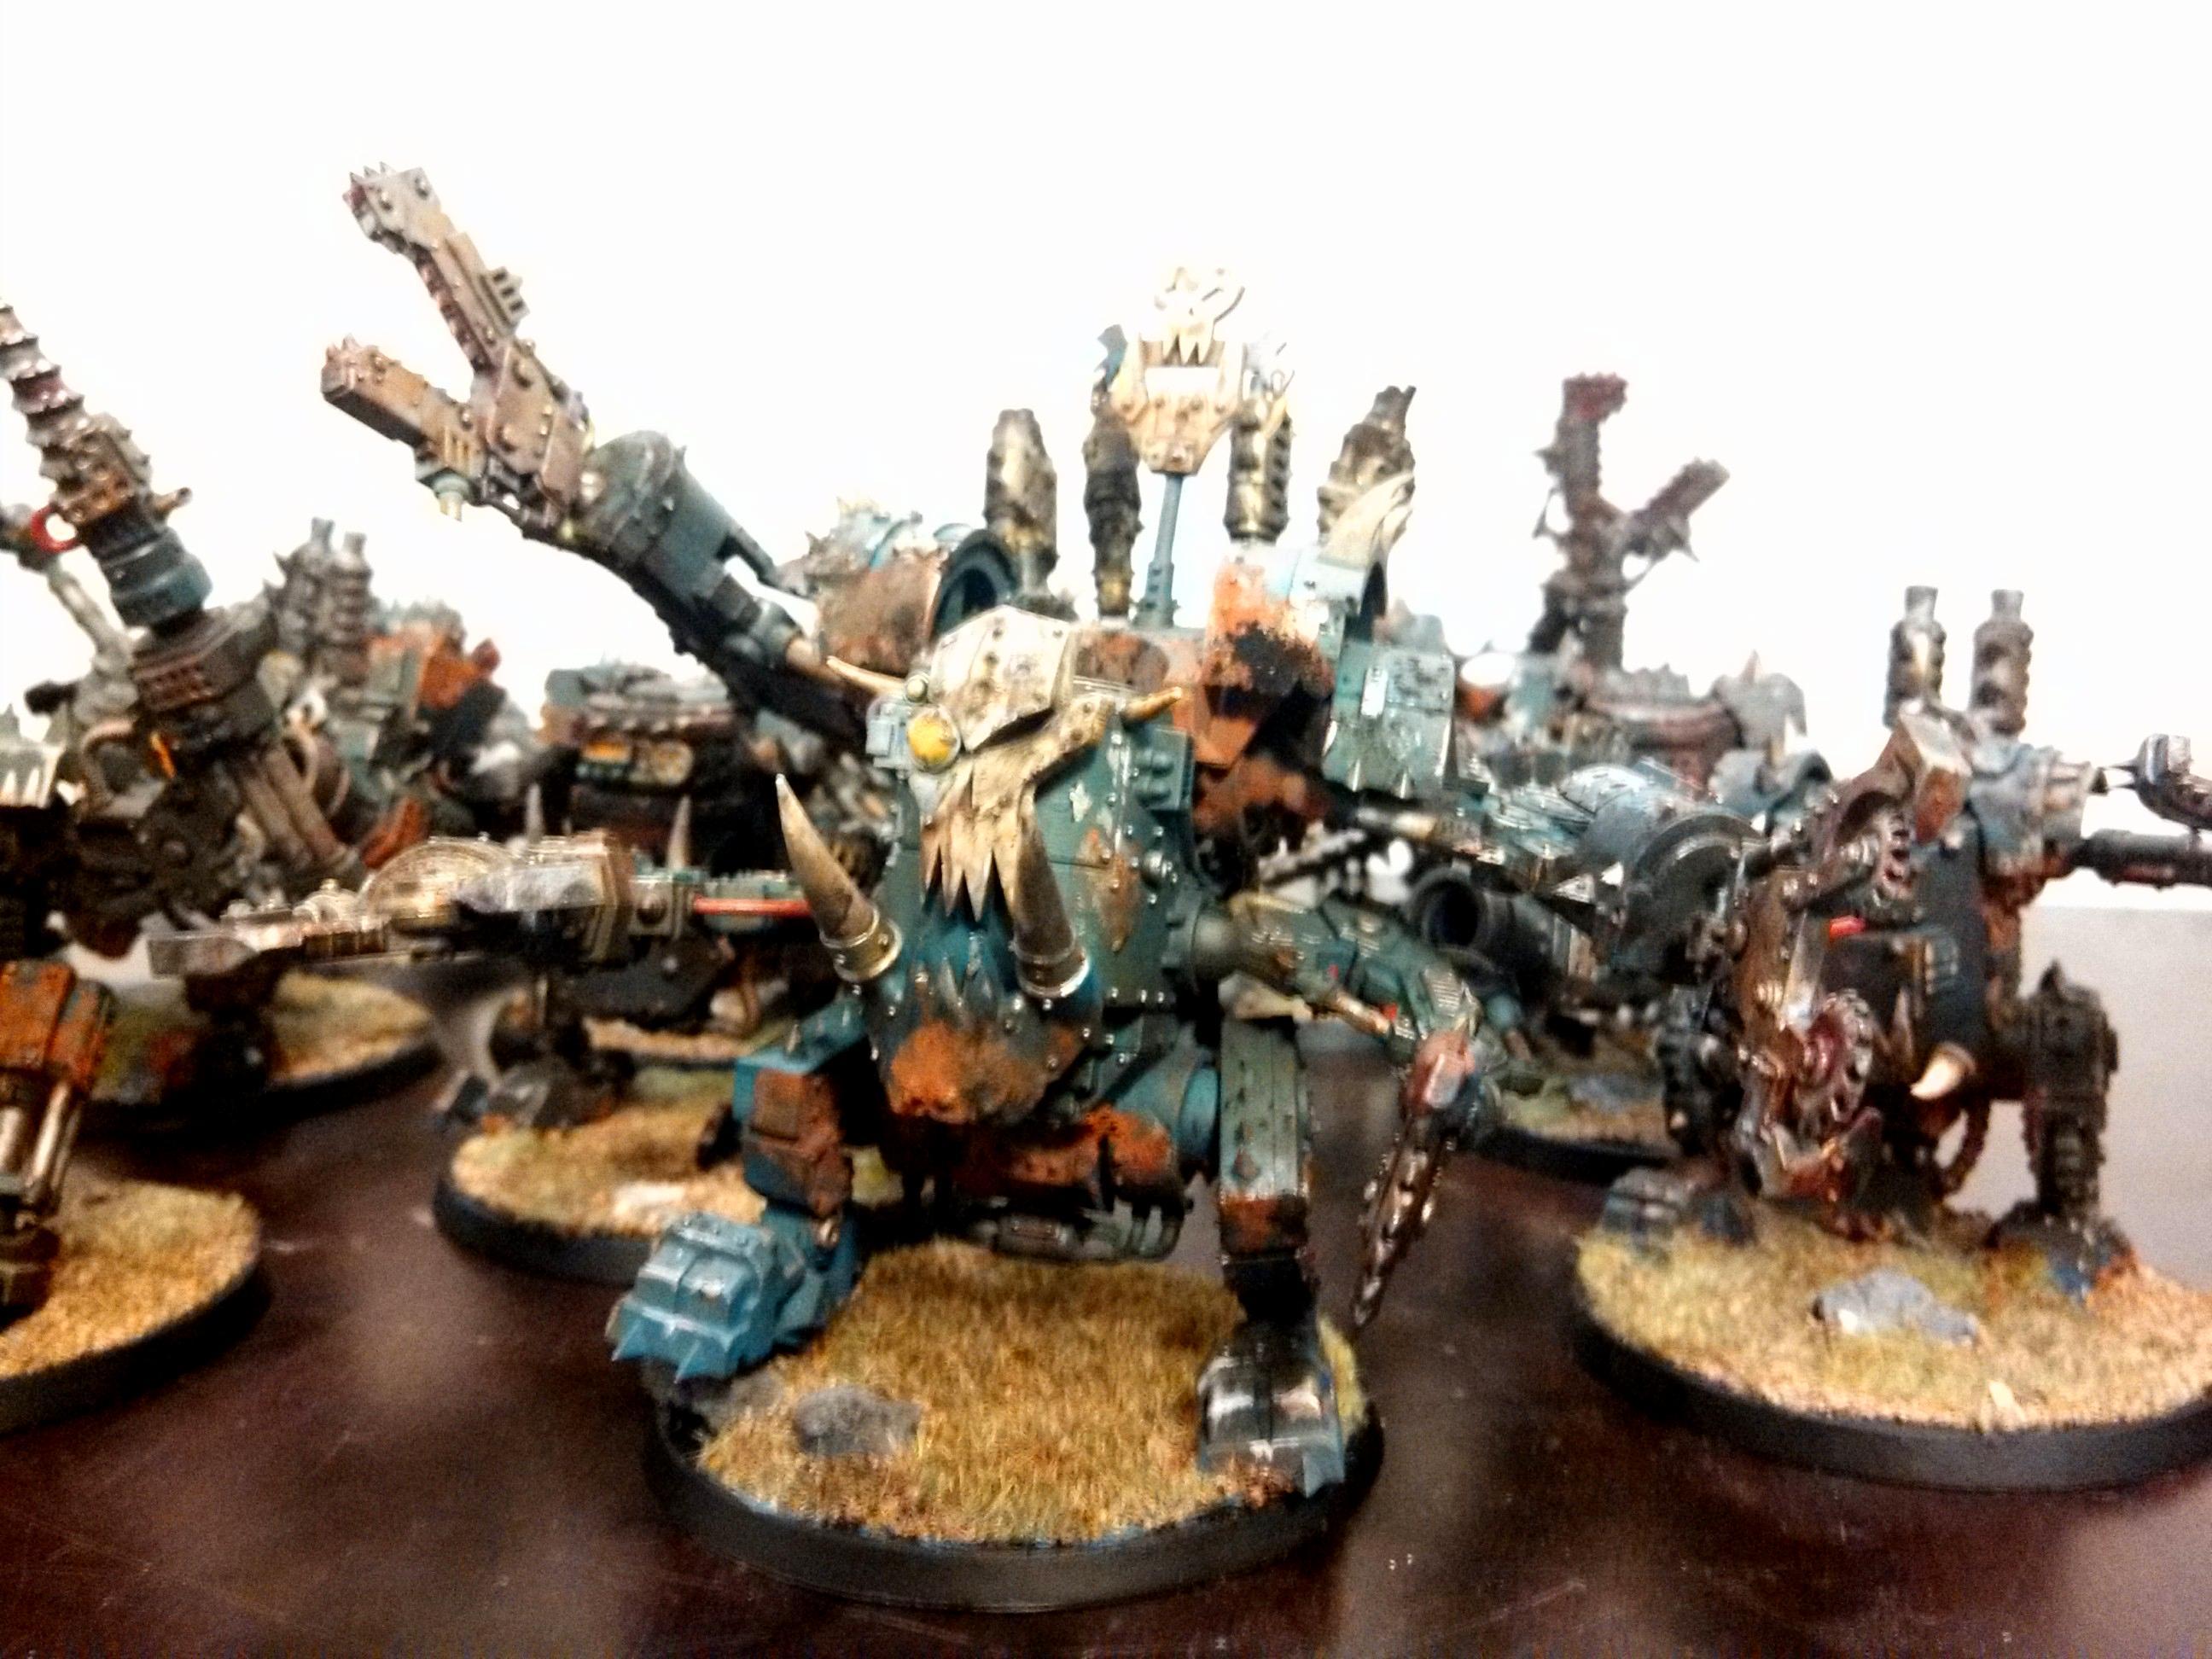 Deathskulls, Deff Dread, Killa Kan, Orks, Warhammer 40,000